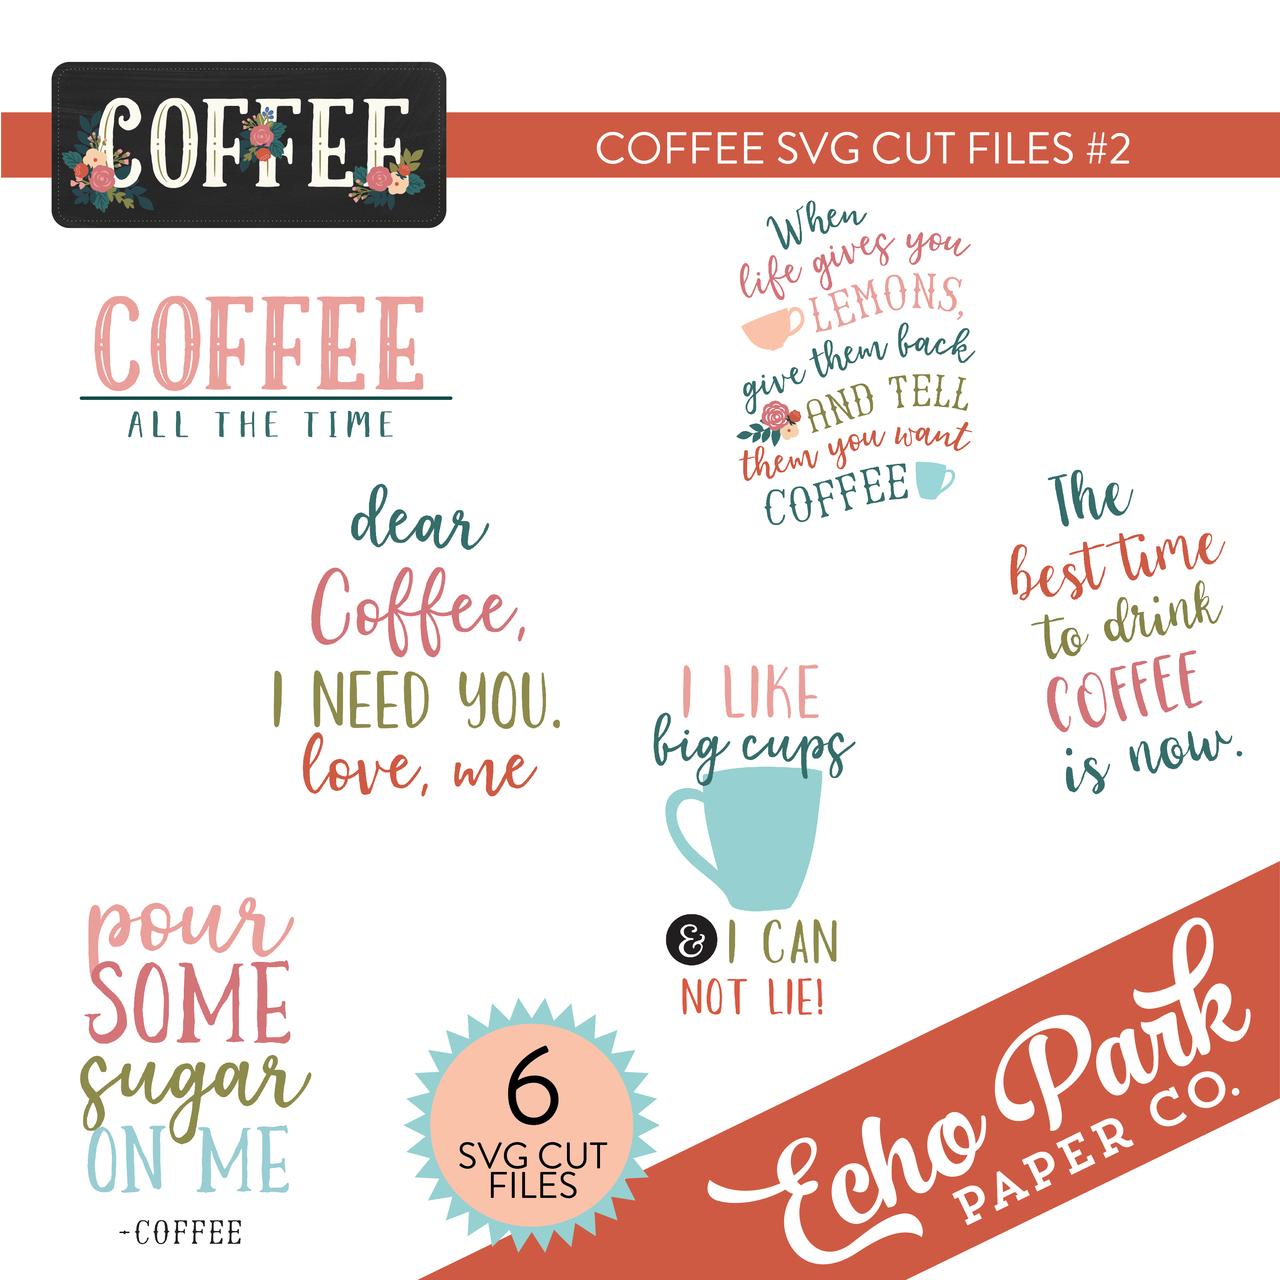 Coffee SVG Cut Files #2